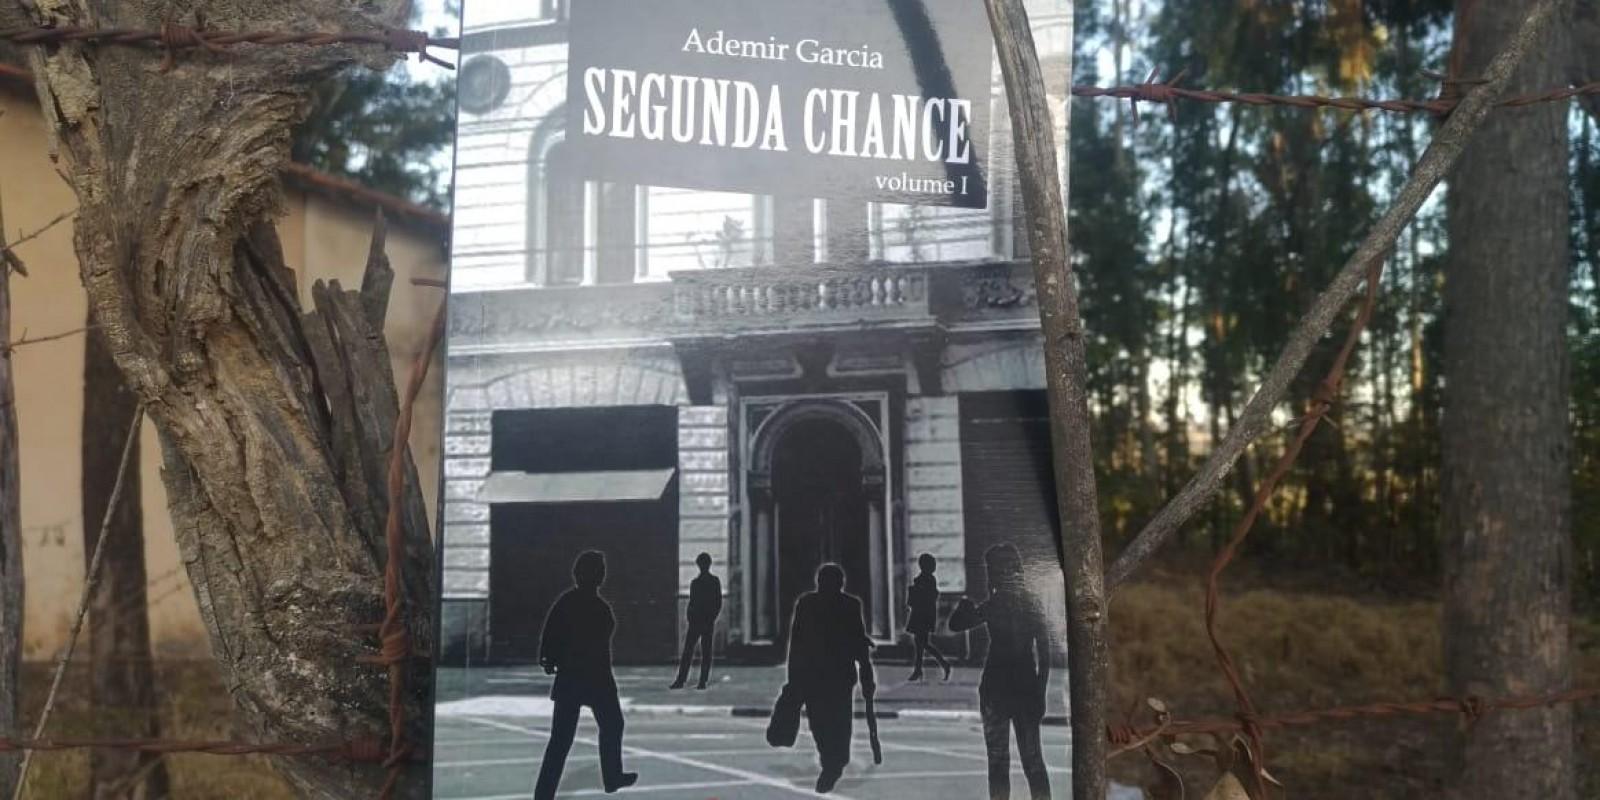 [SEGUNDA CHANCE – VOLUME 1/ Ademir Garcia]